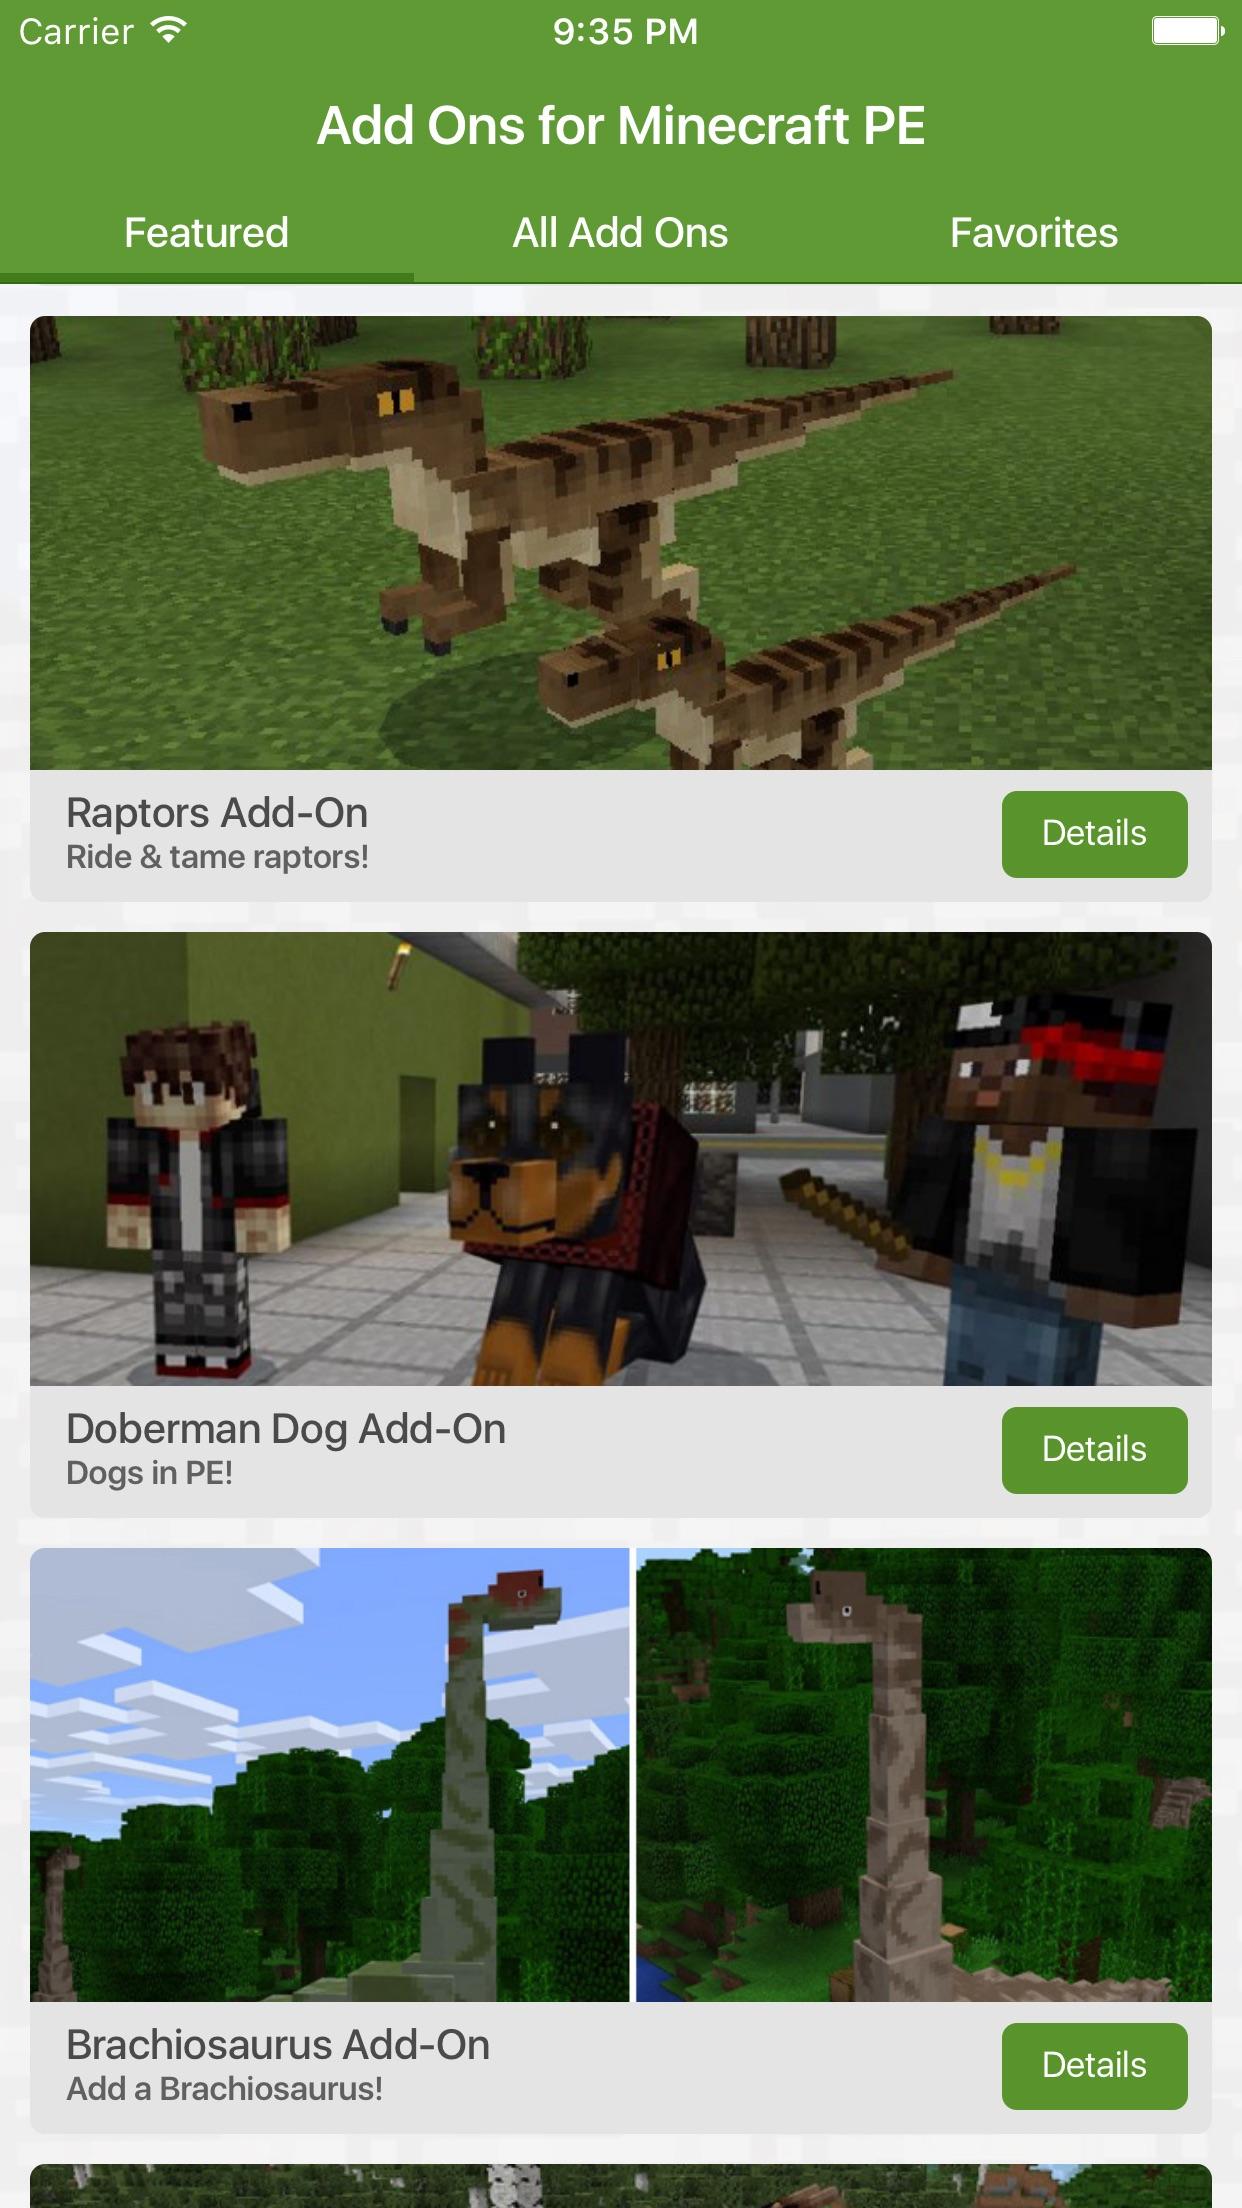 Add Ons for Minecraft PE (Minecraft Addons) Screenshot